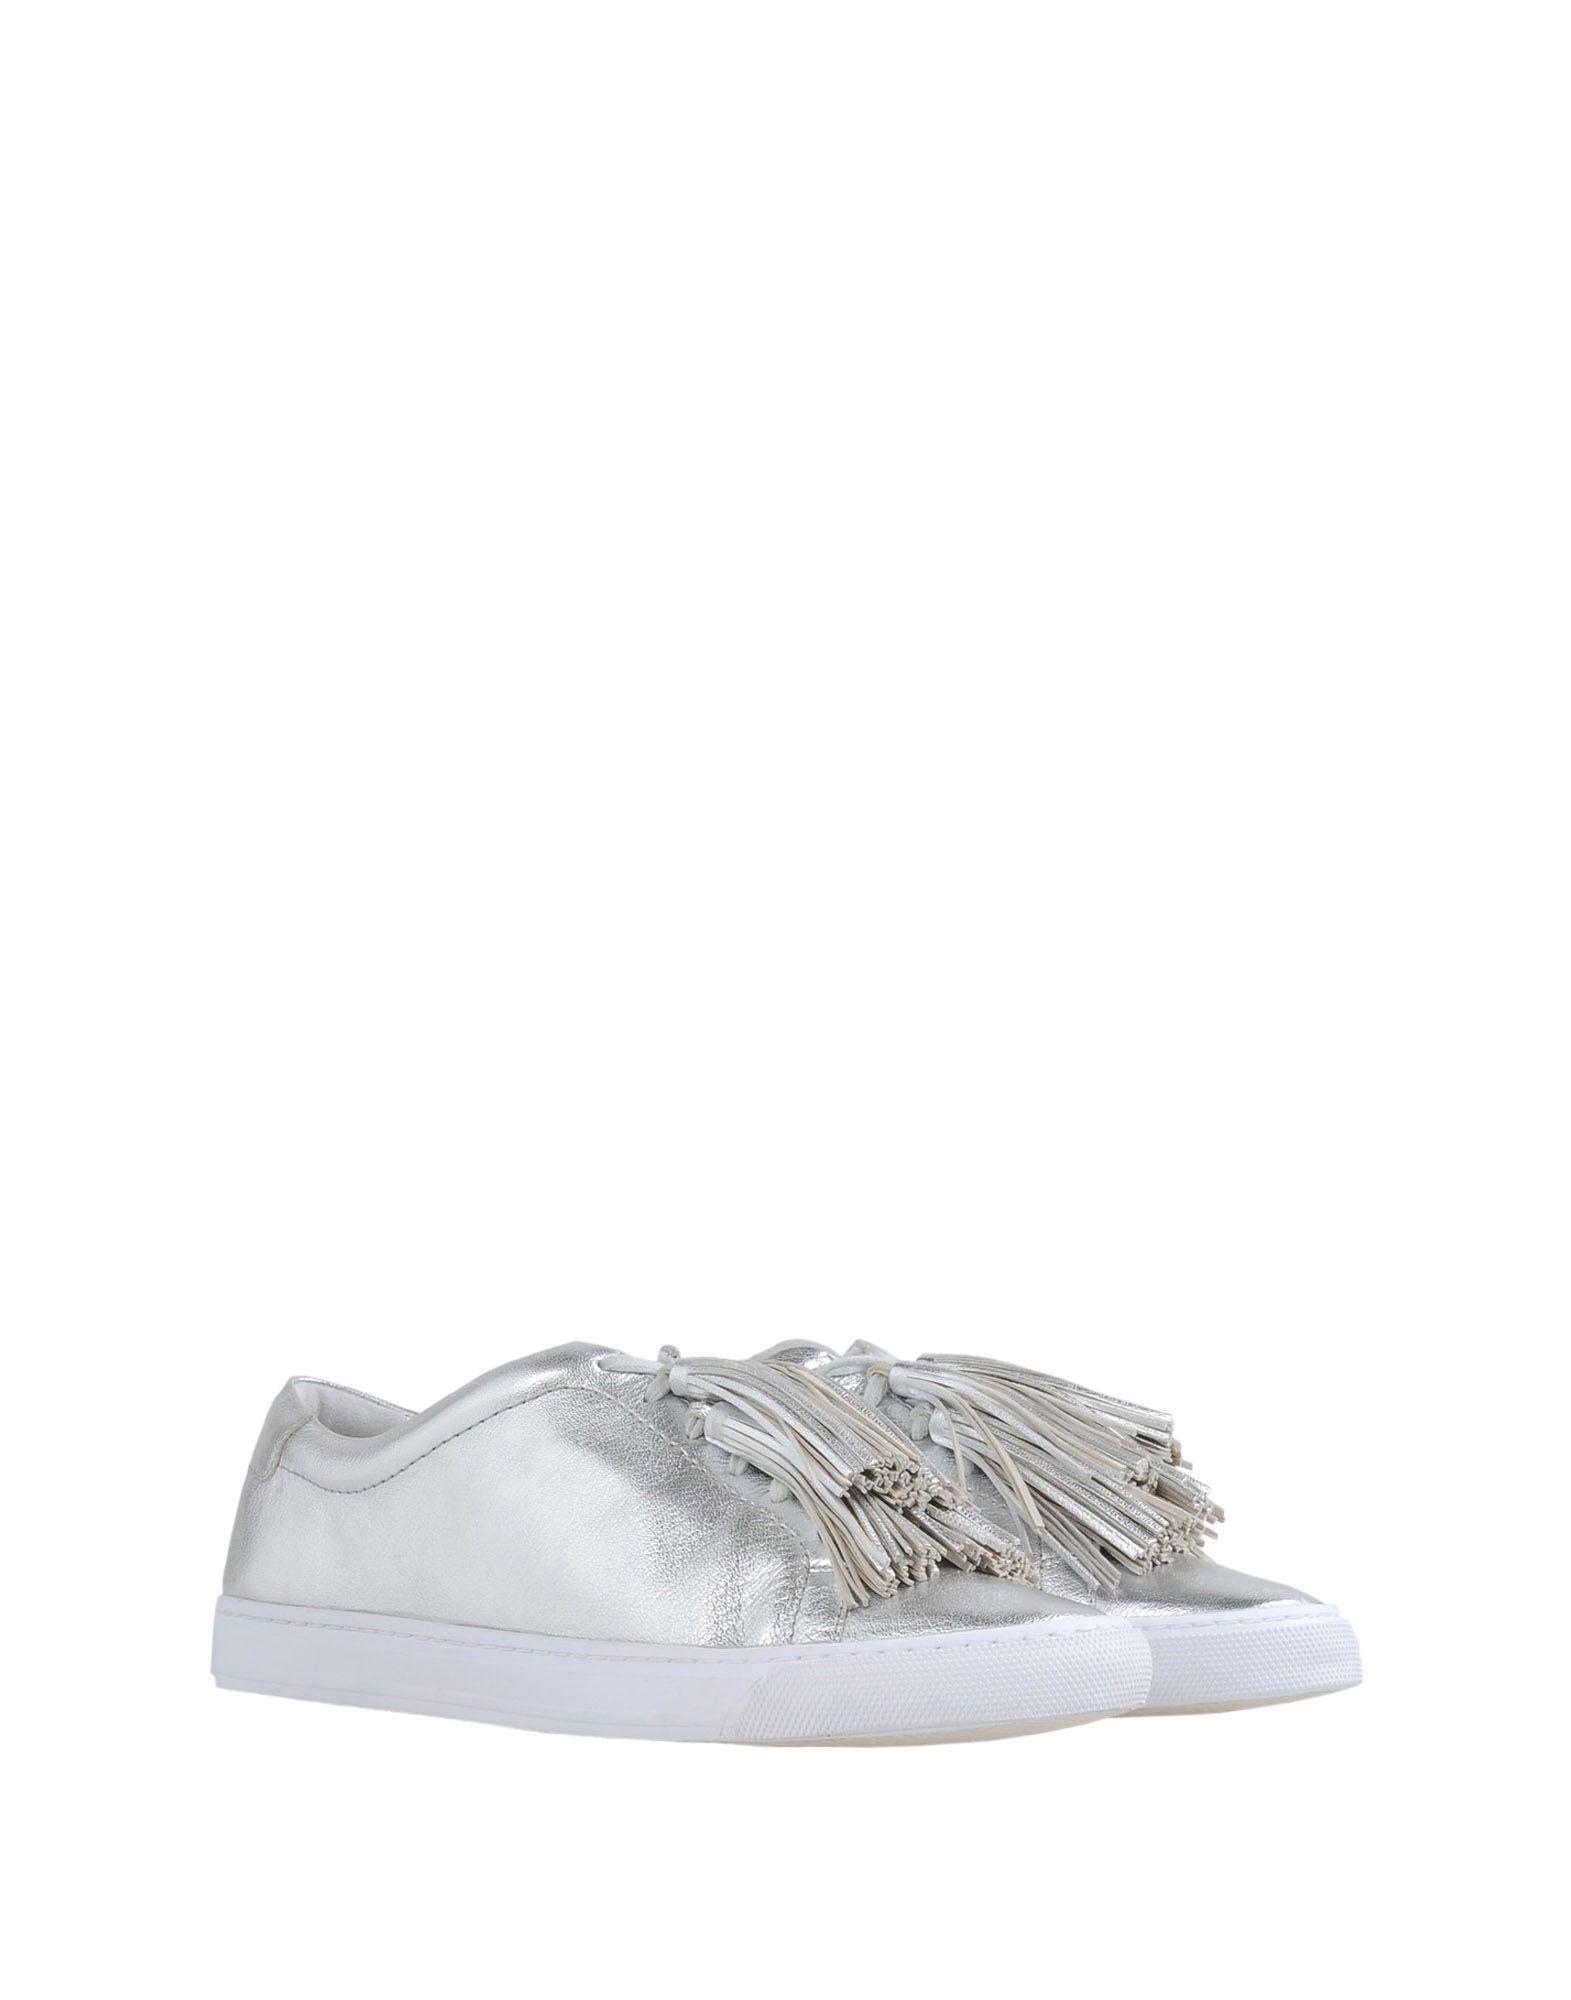 ... Sneakers Loeffler Randall Logan - Femme - Sneakers Loeffler Randall sur